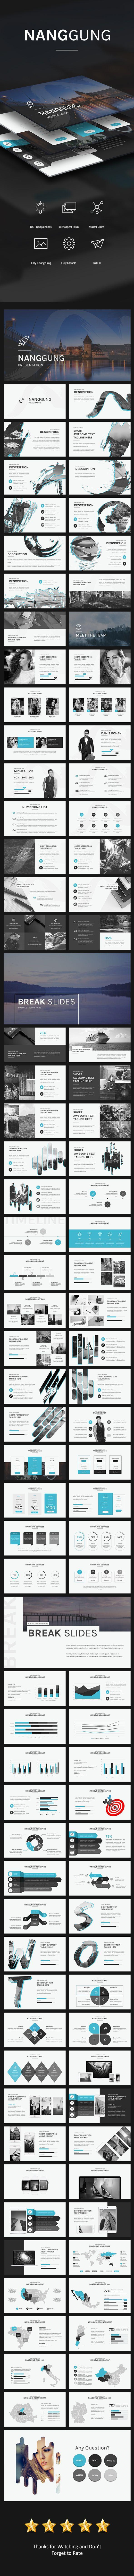 Nanggung Google Slides - Google Slides Presentation Templates ...